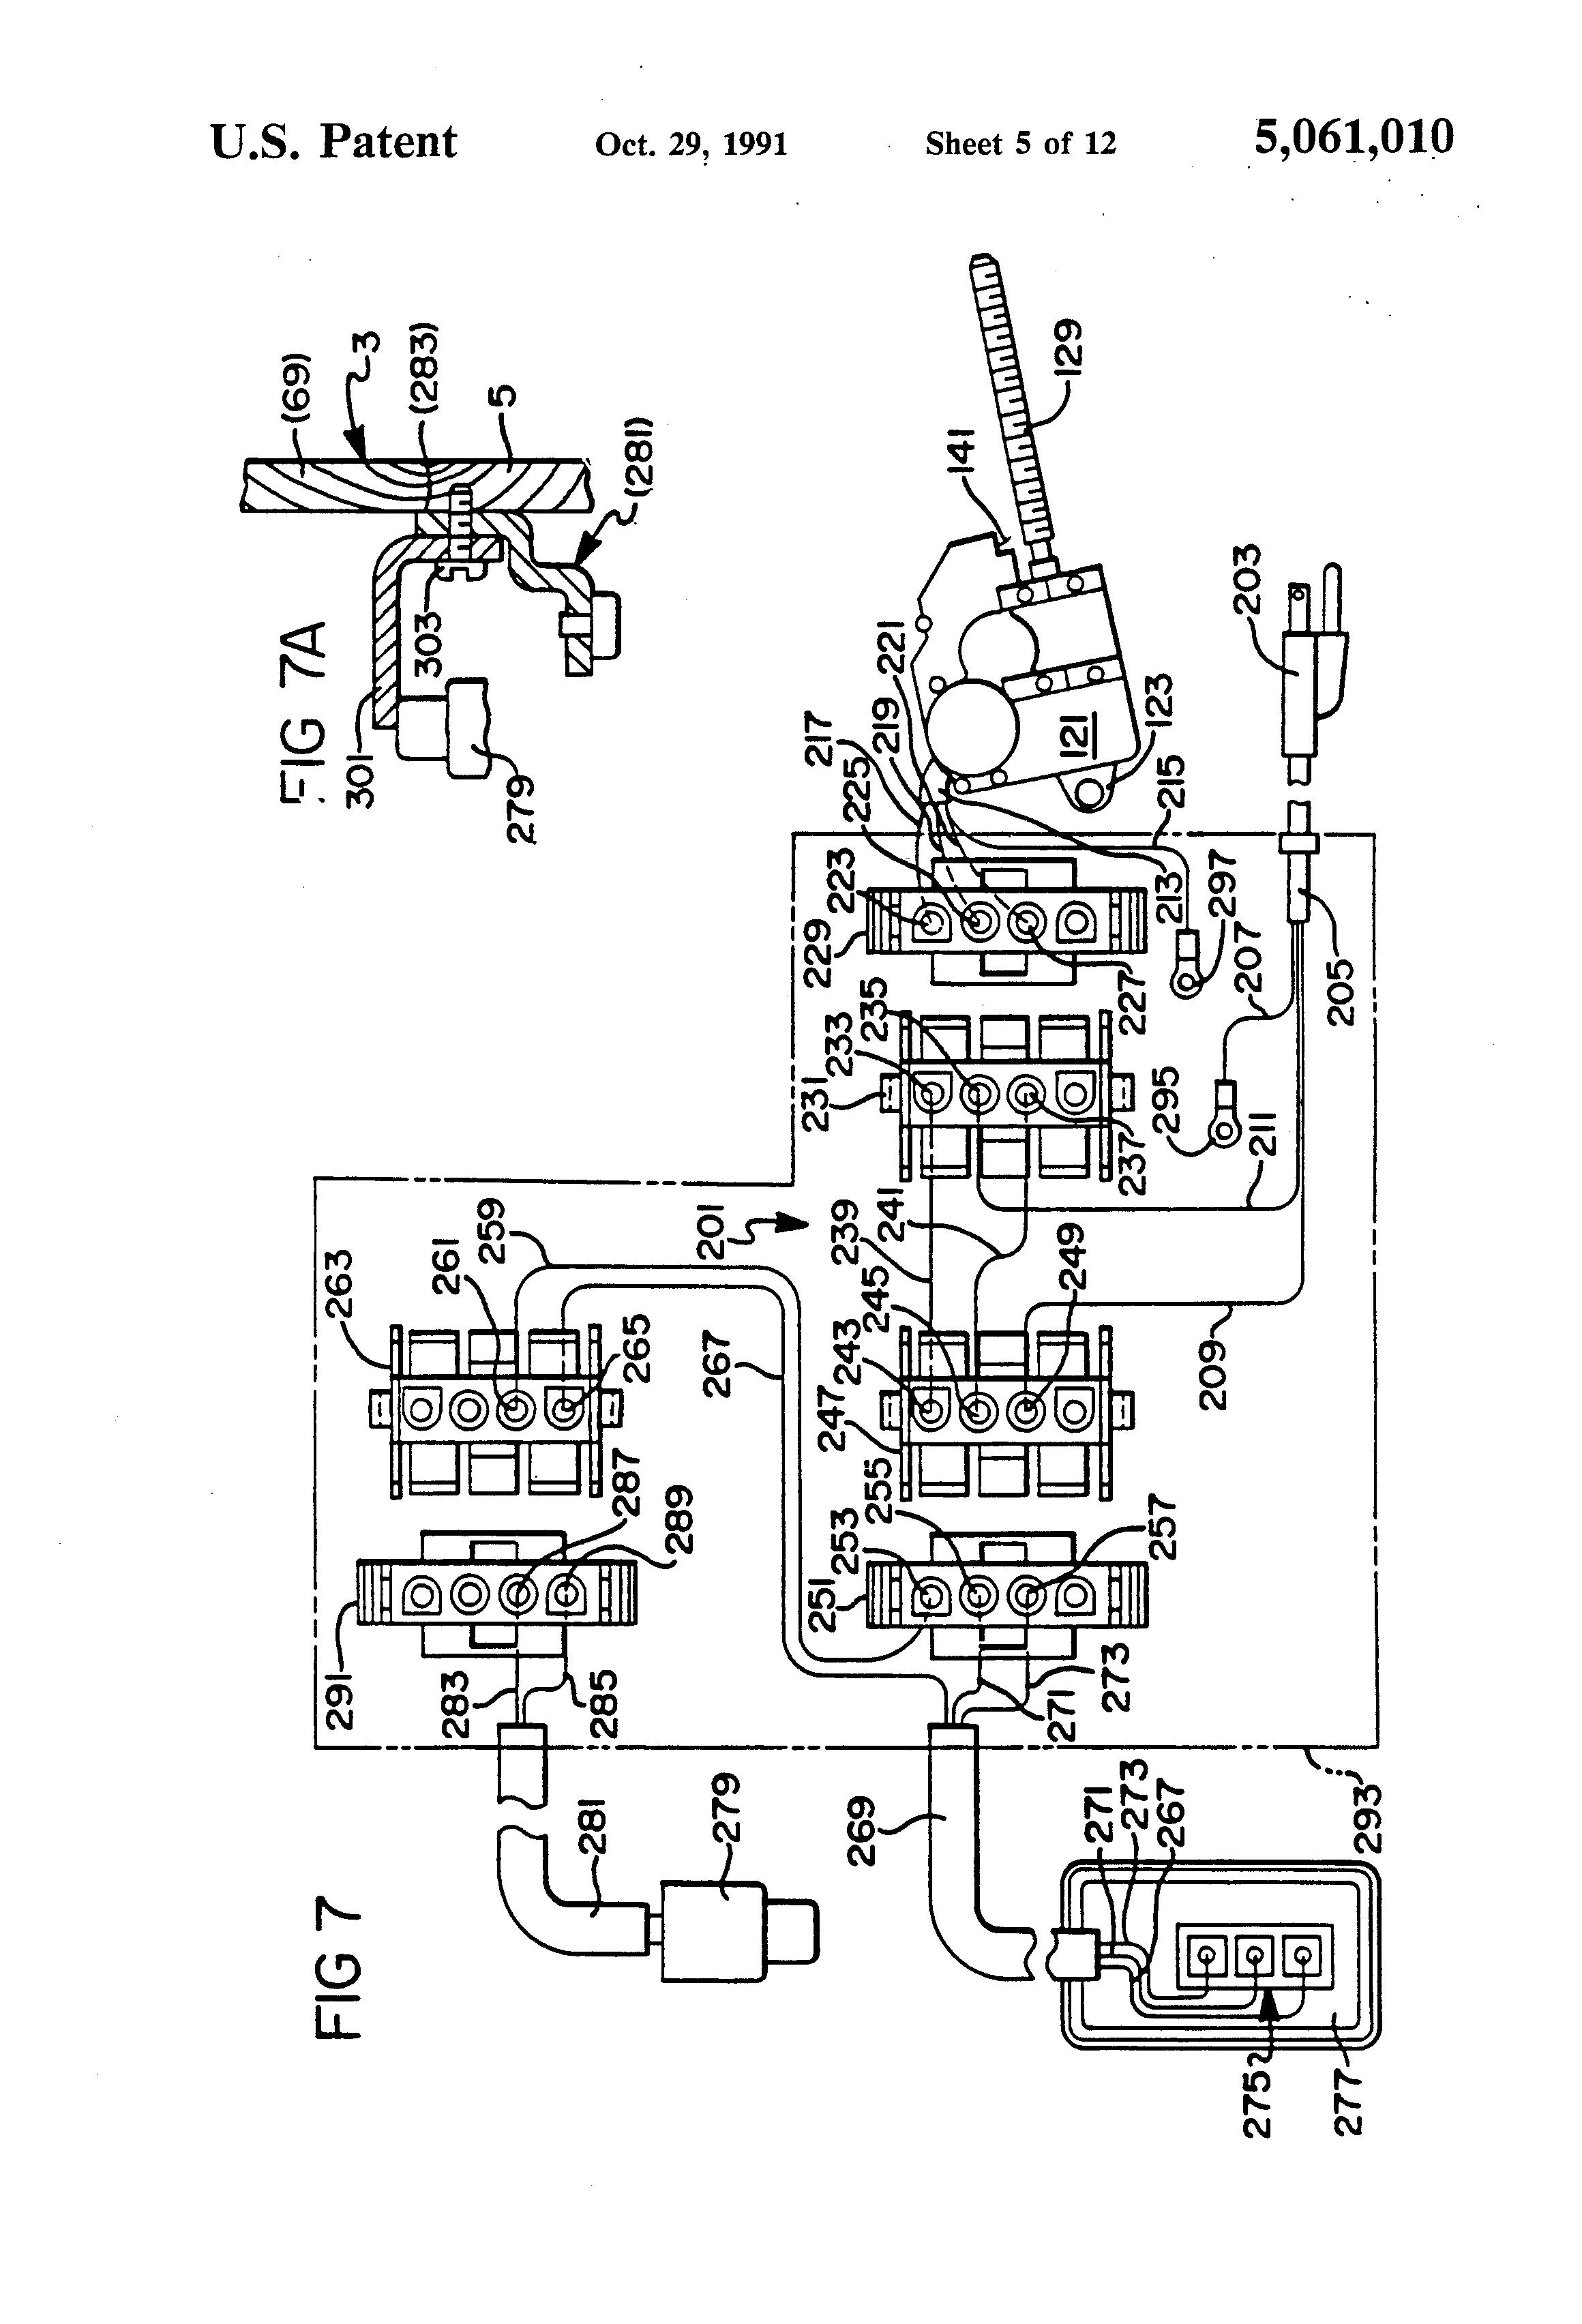 Hc-2802-gt3 Recliner Remote Wiring Diagram